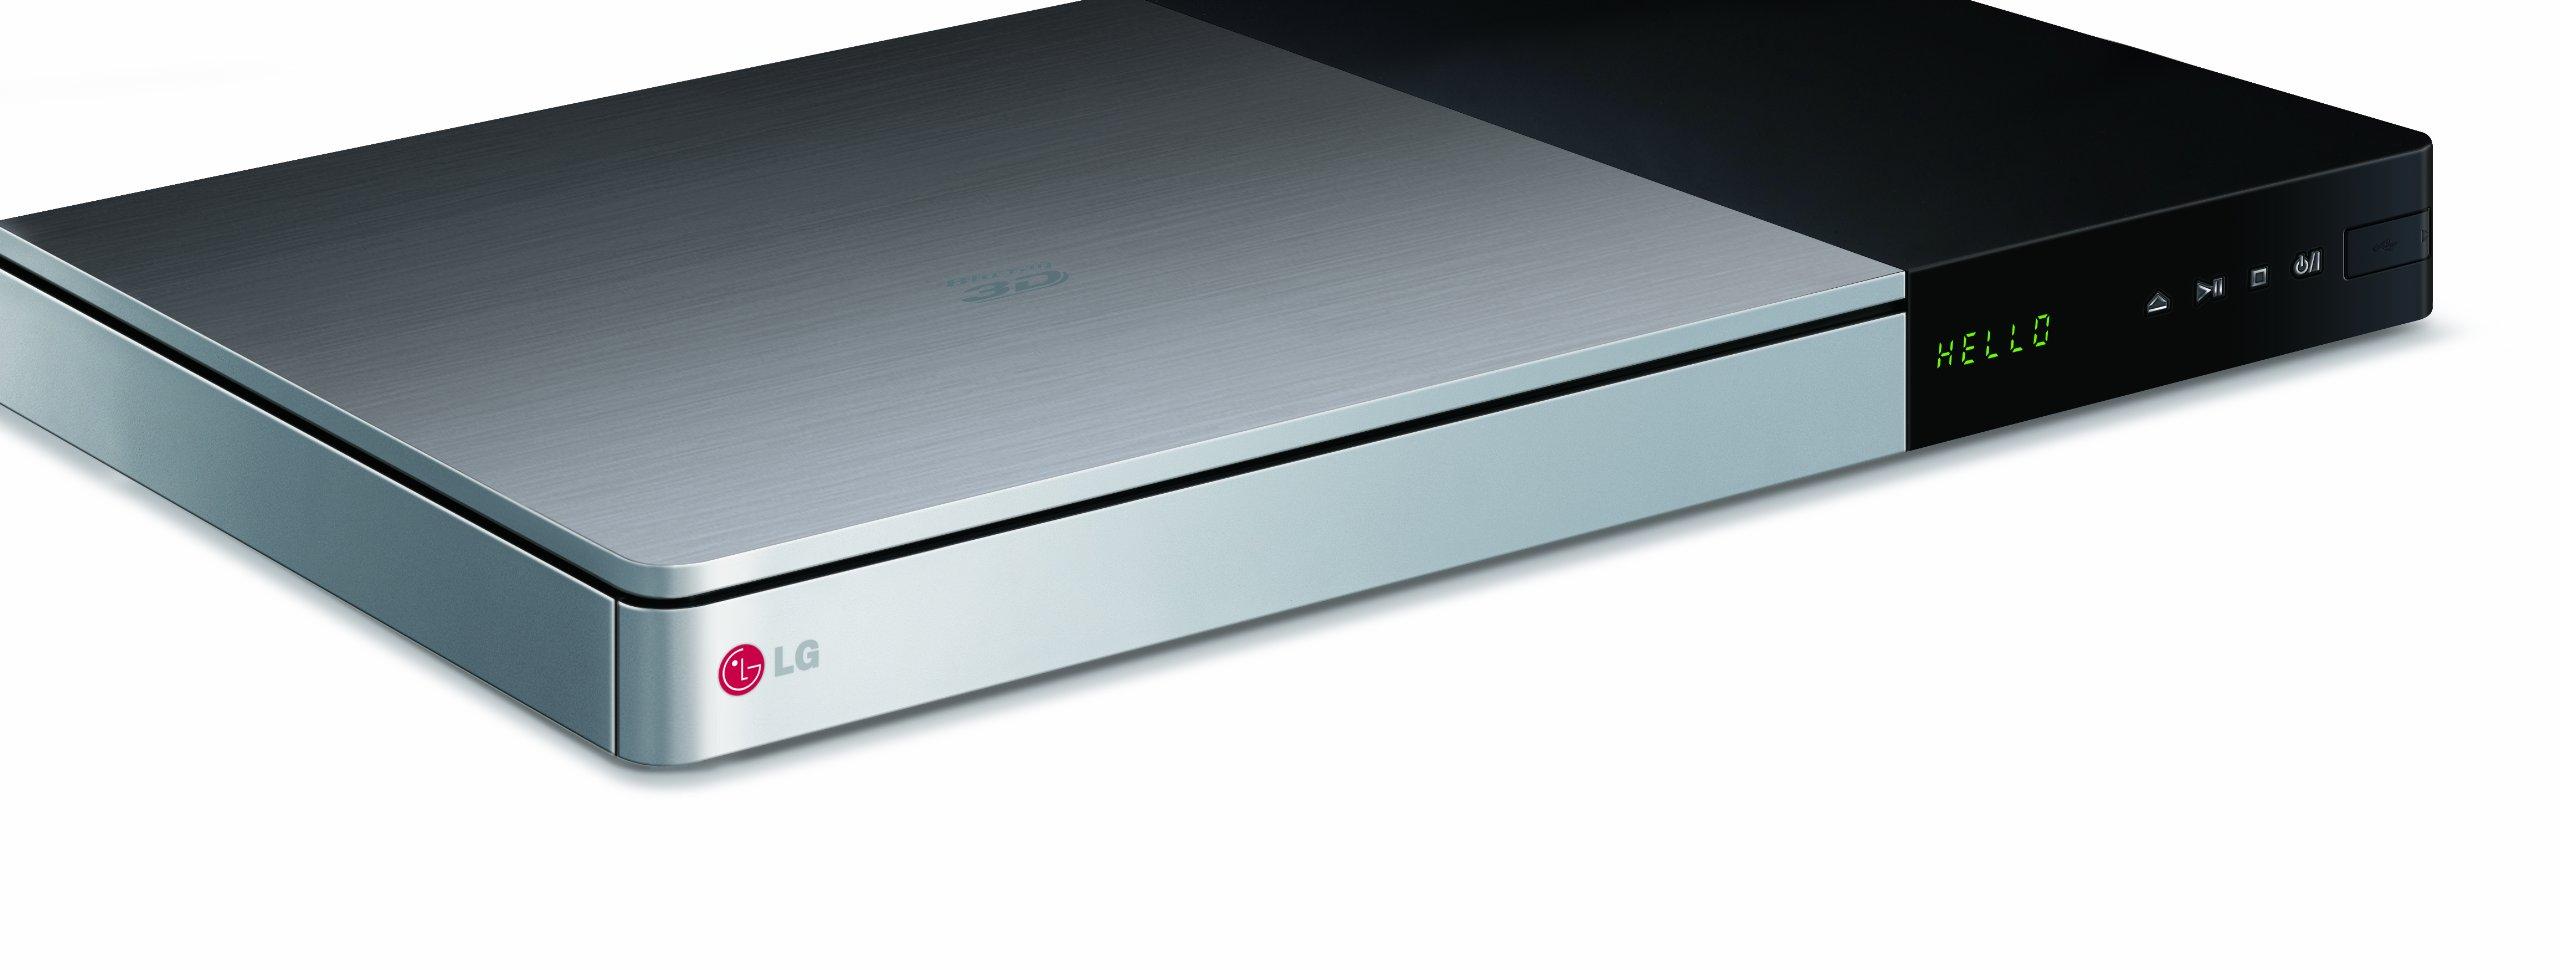 LG BP740 - Reproductor de BLU-Ray (3D, Internet, Dolby Digital ...